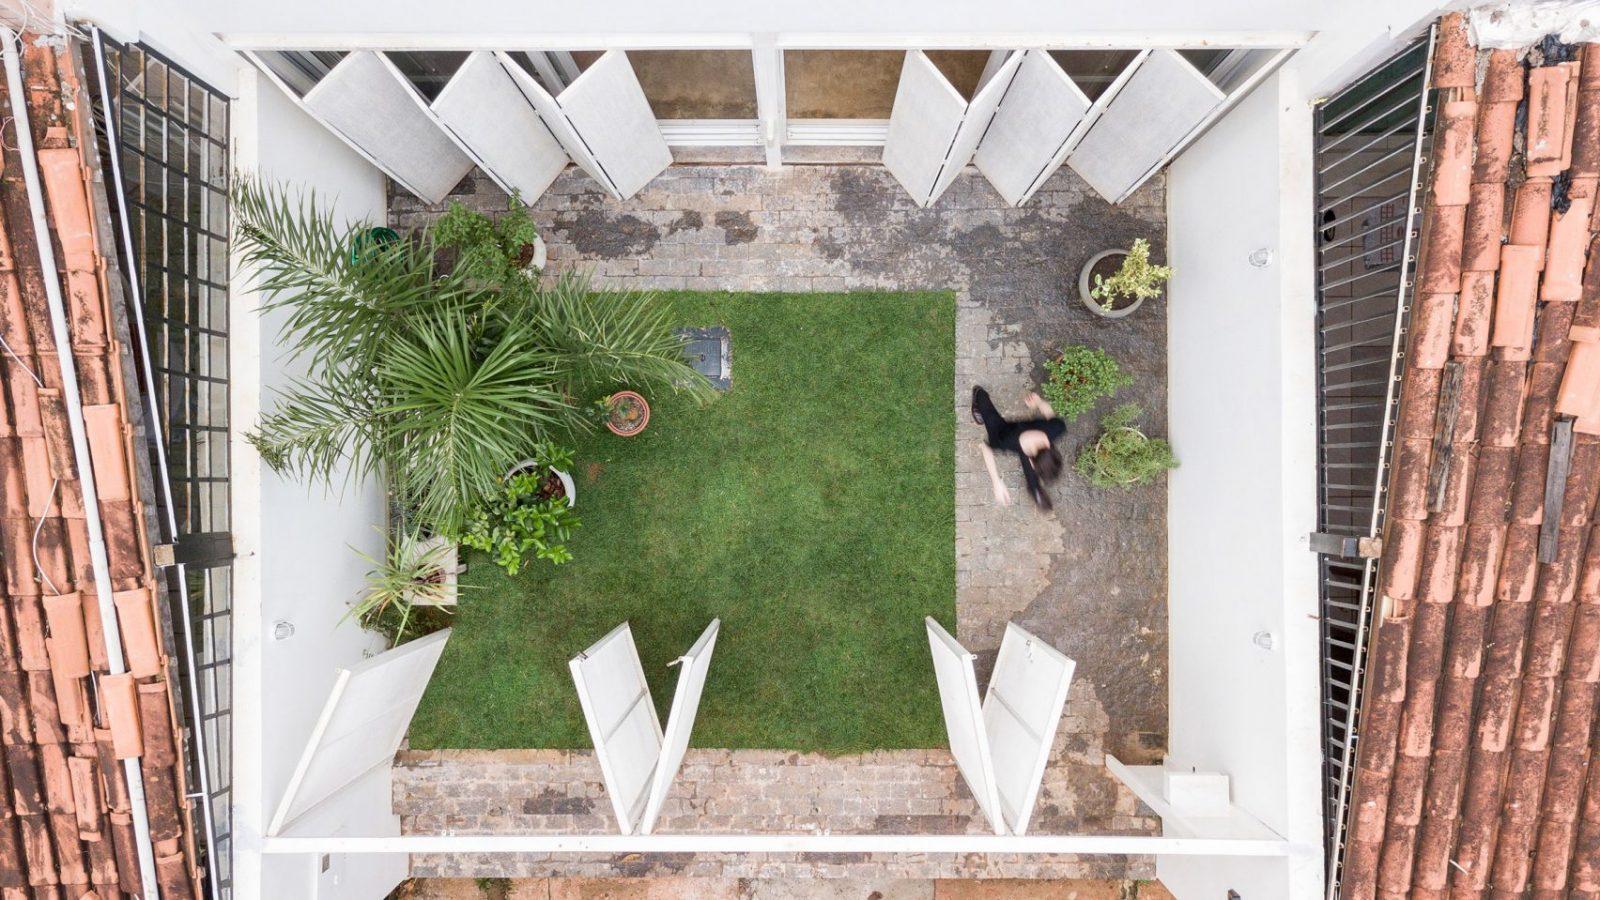 casa-711h-bloco-arquitetos-Joana-Franca-01-1600x900